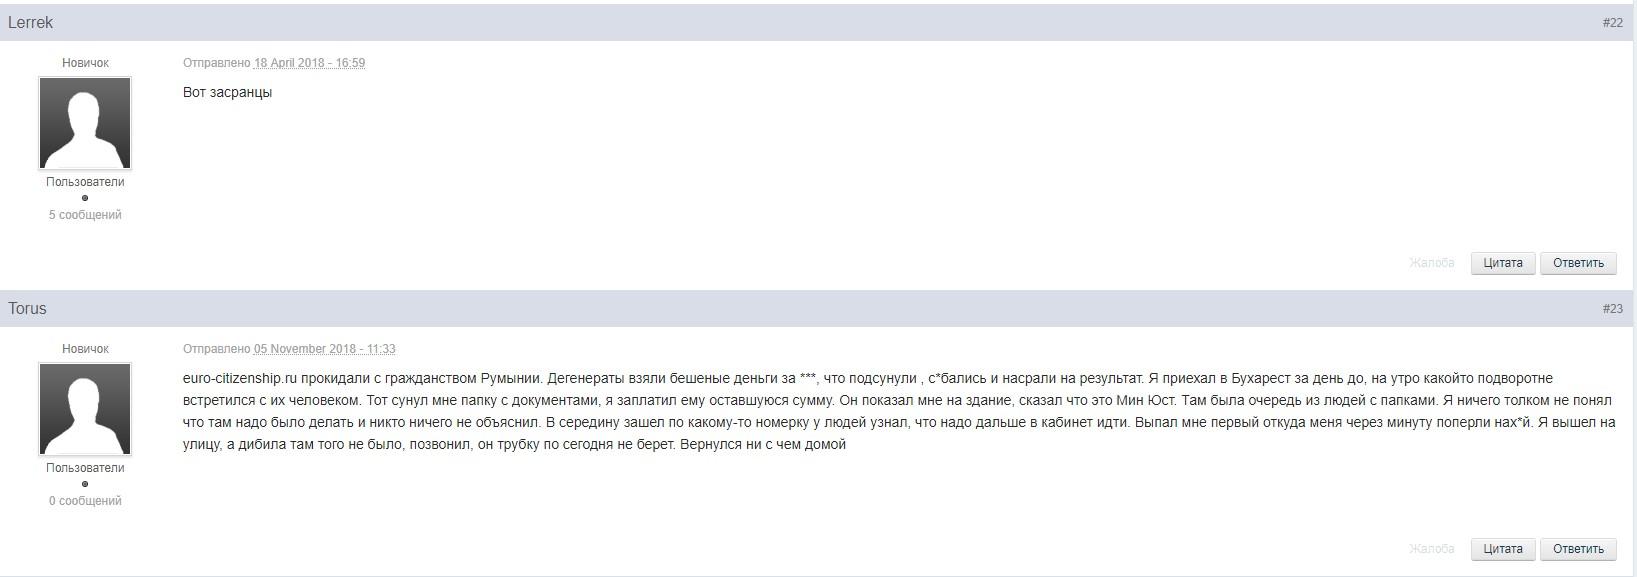 euro-citizenship.ru отзывы клиентов на сайте forum-eu.com